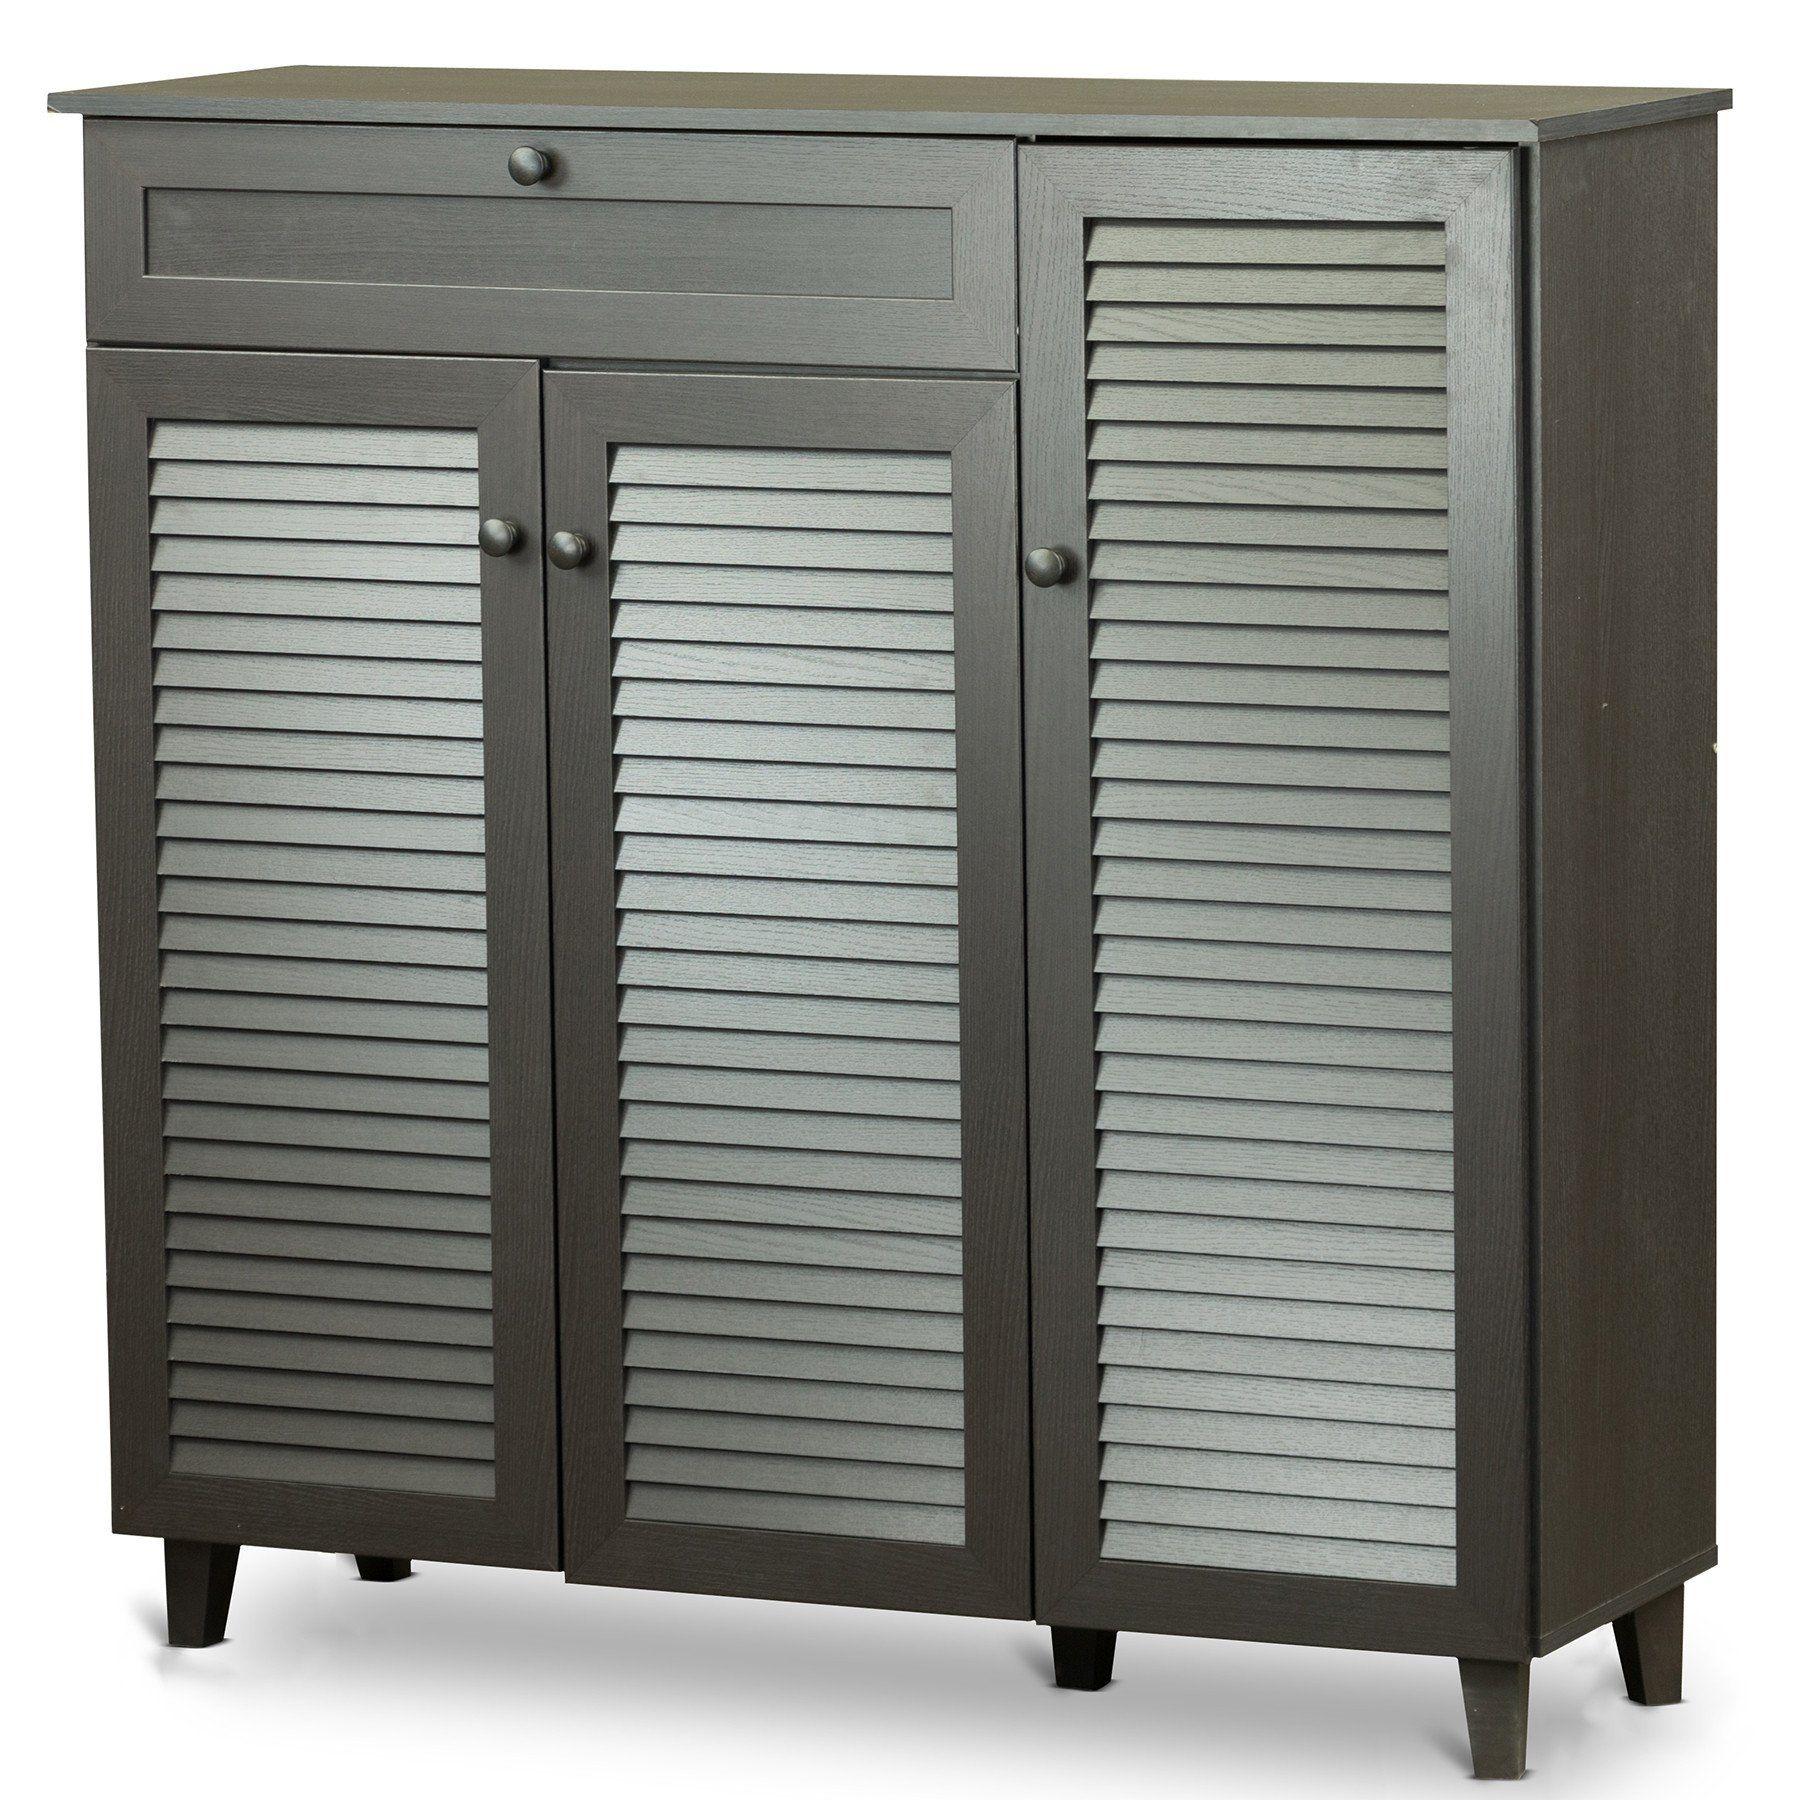 Good Pocillo Shoe Storage Cabinet